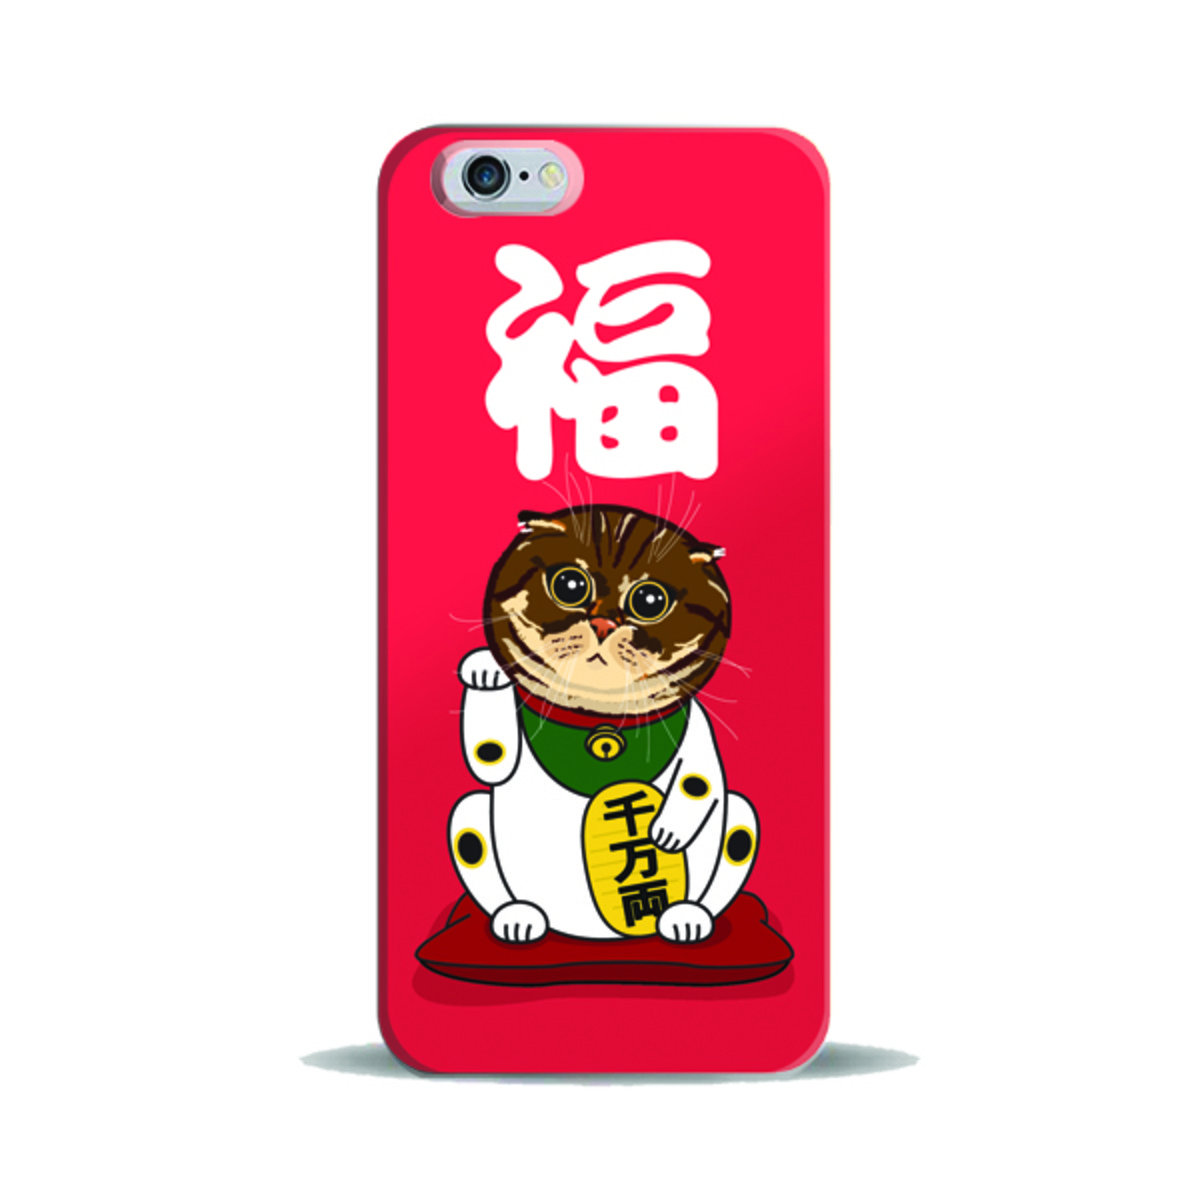 "iPhase - iPhone 6 (4.7"") 手機膠殼電話保護套 4.7寸  (招財版-喵喵) (另有適合iPhone 6 Plus 5.5寸型號)"